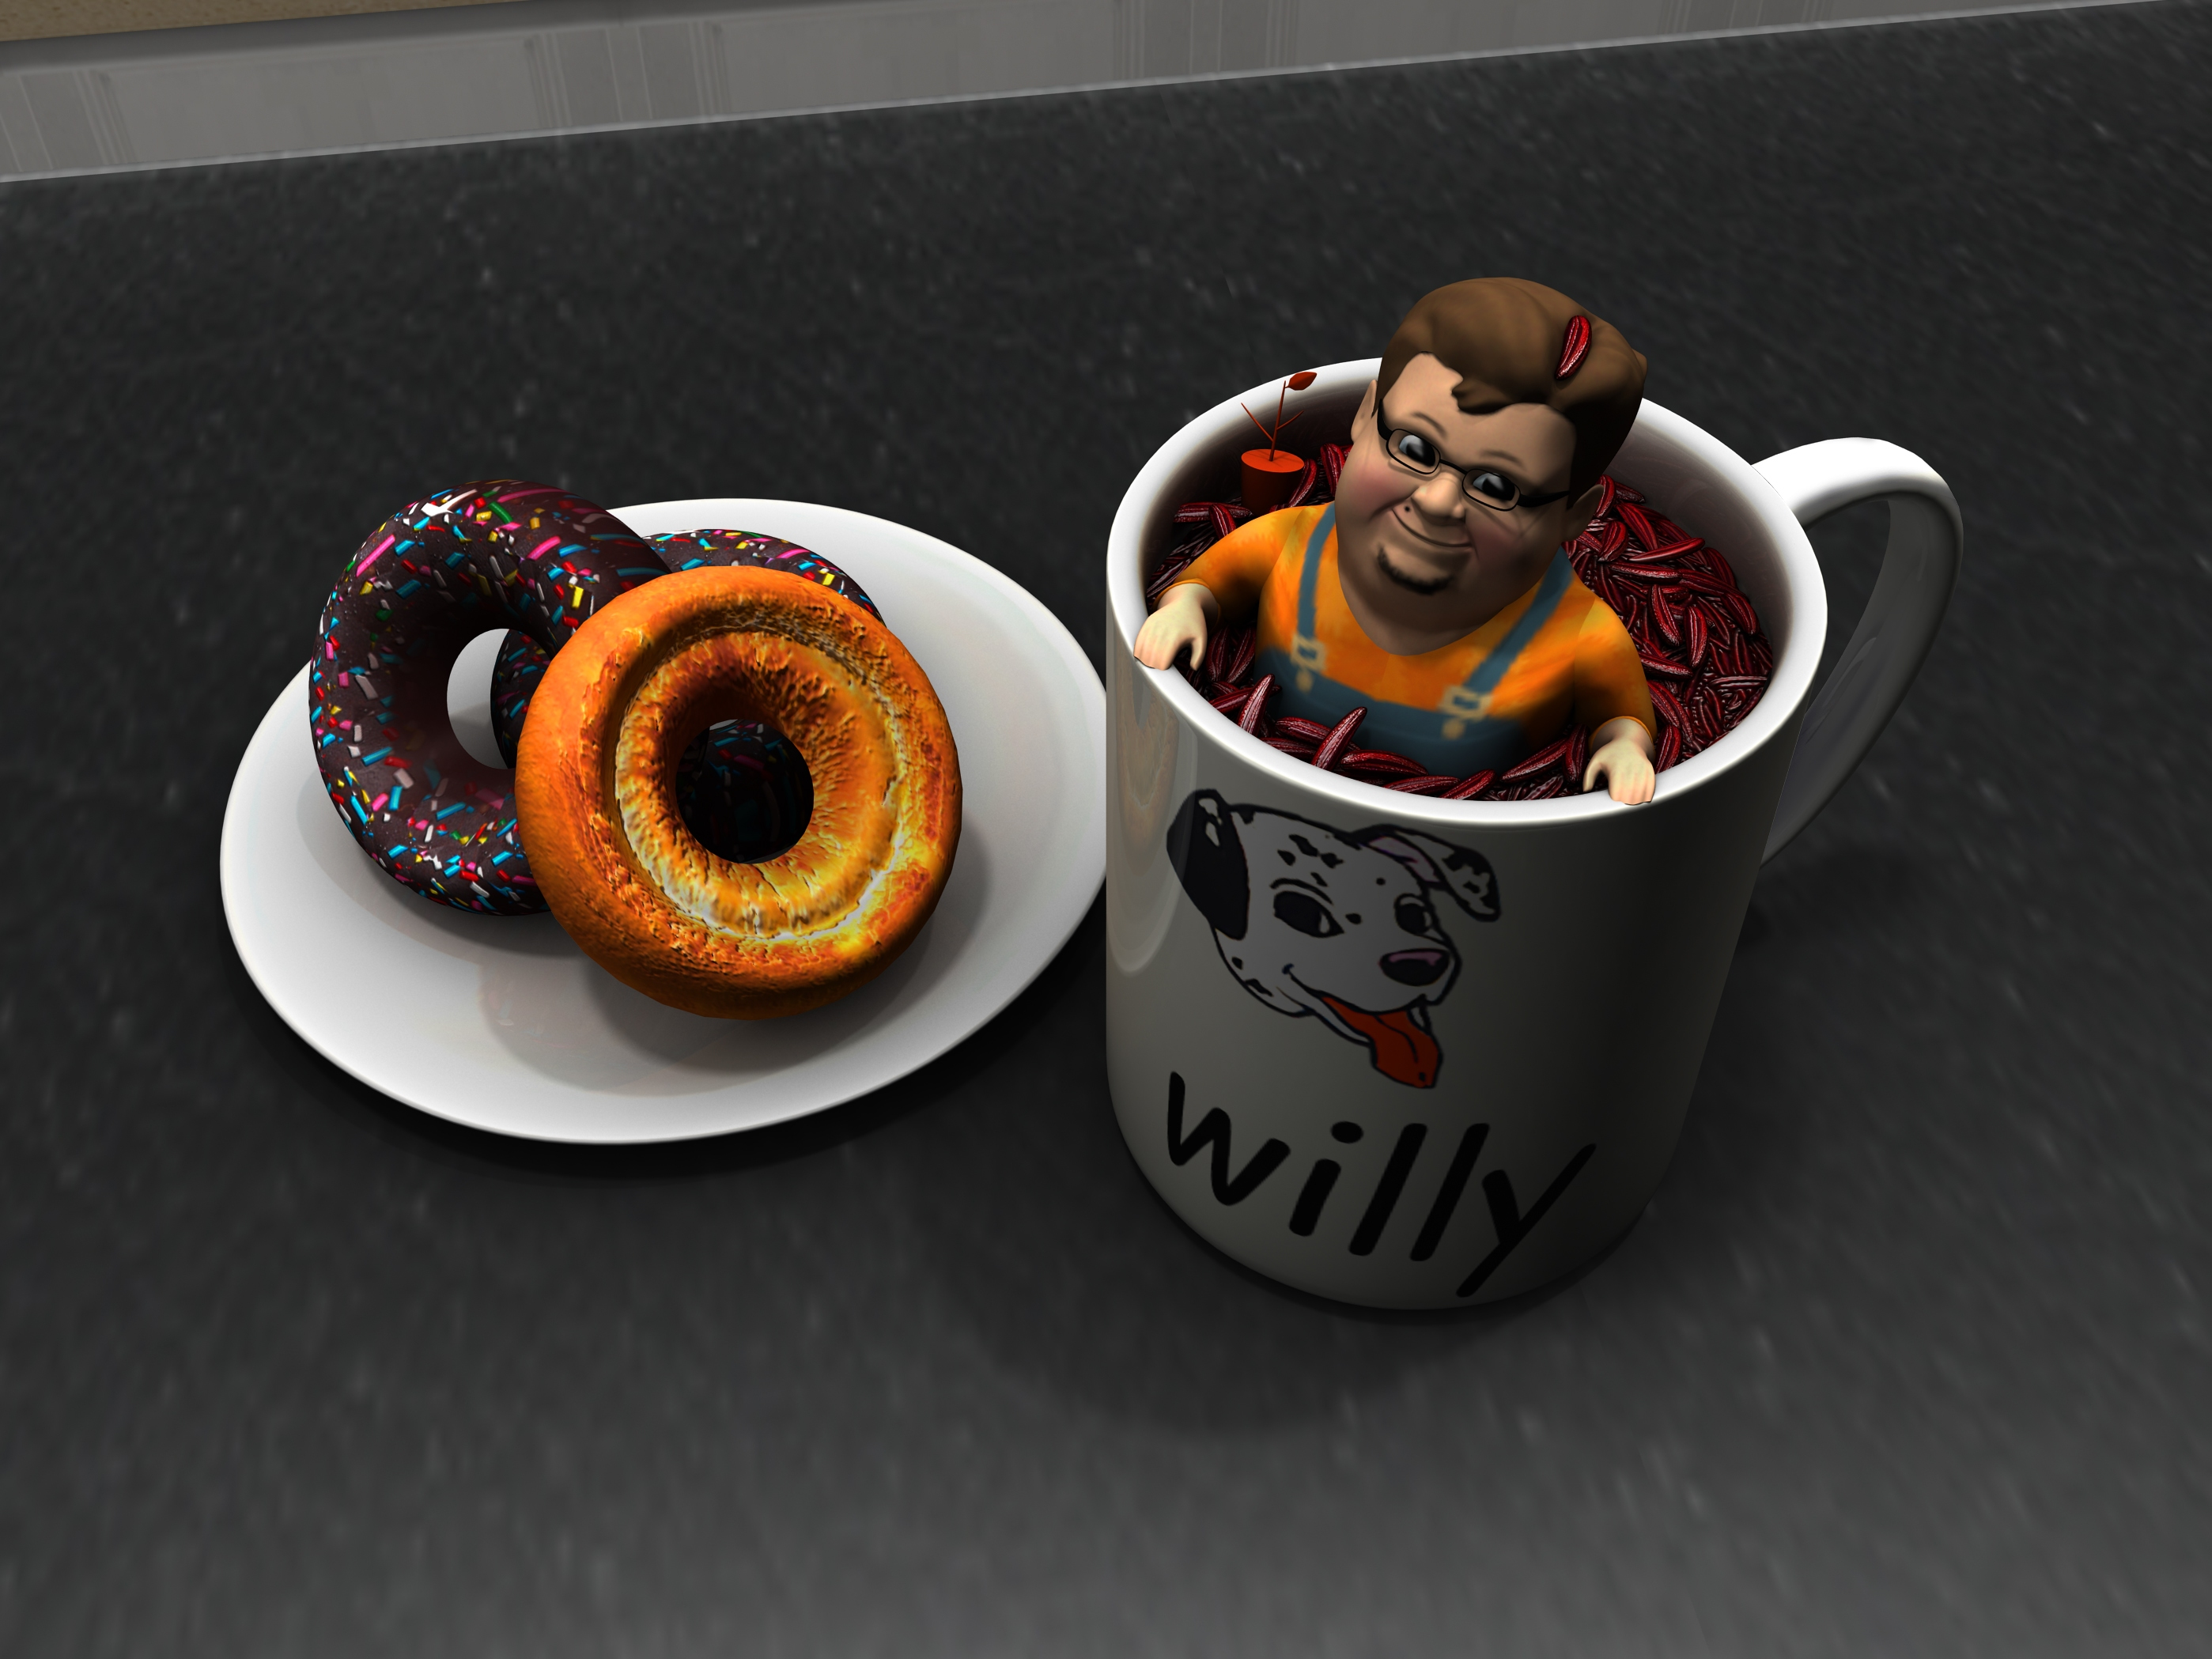 artwork-fk-in-the-coffee-1